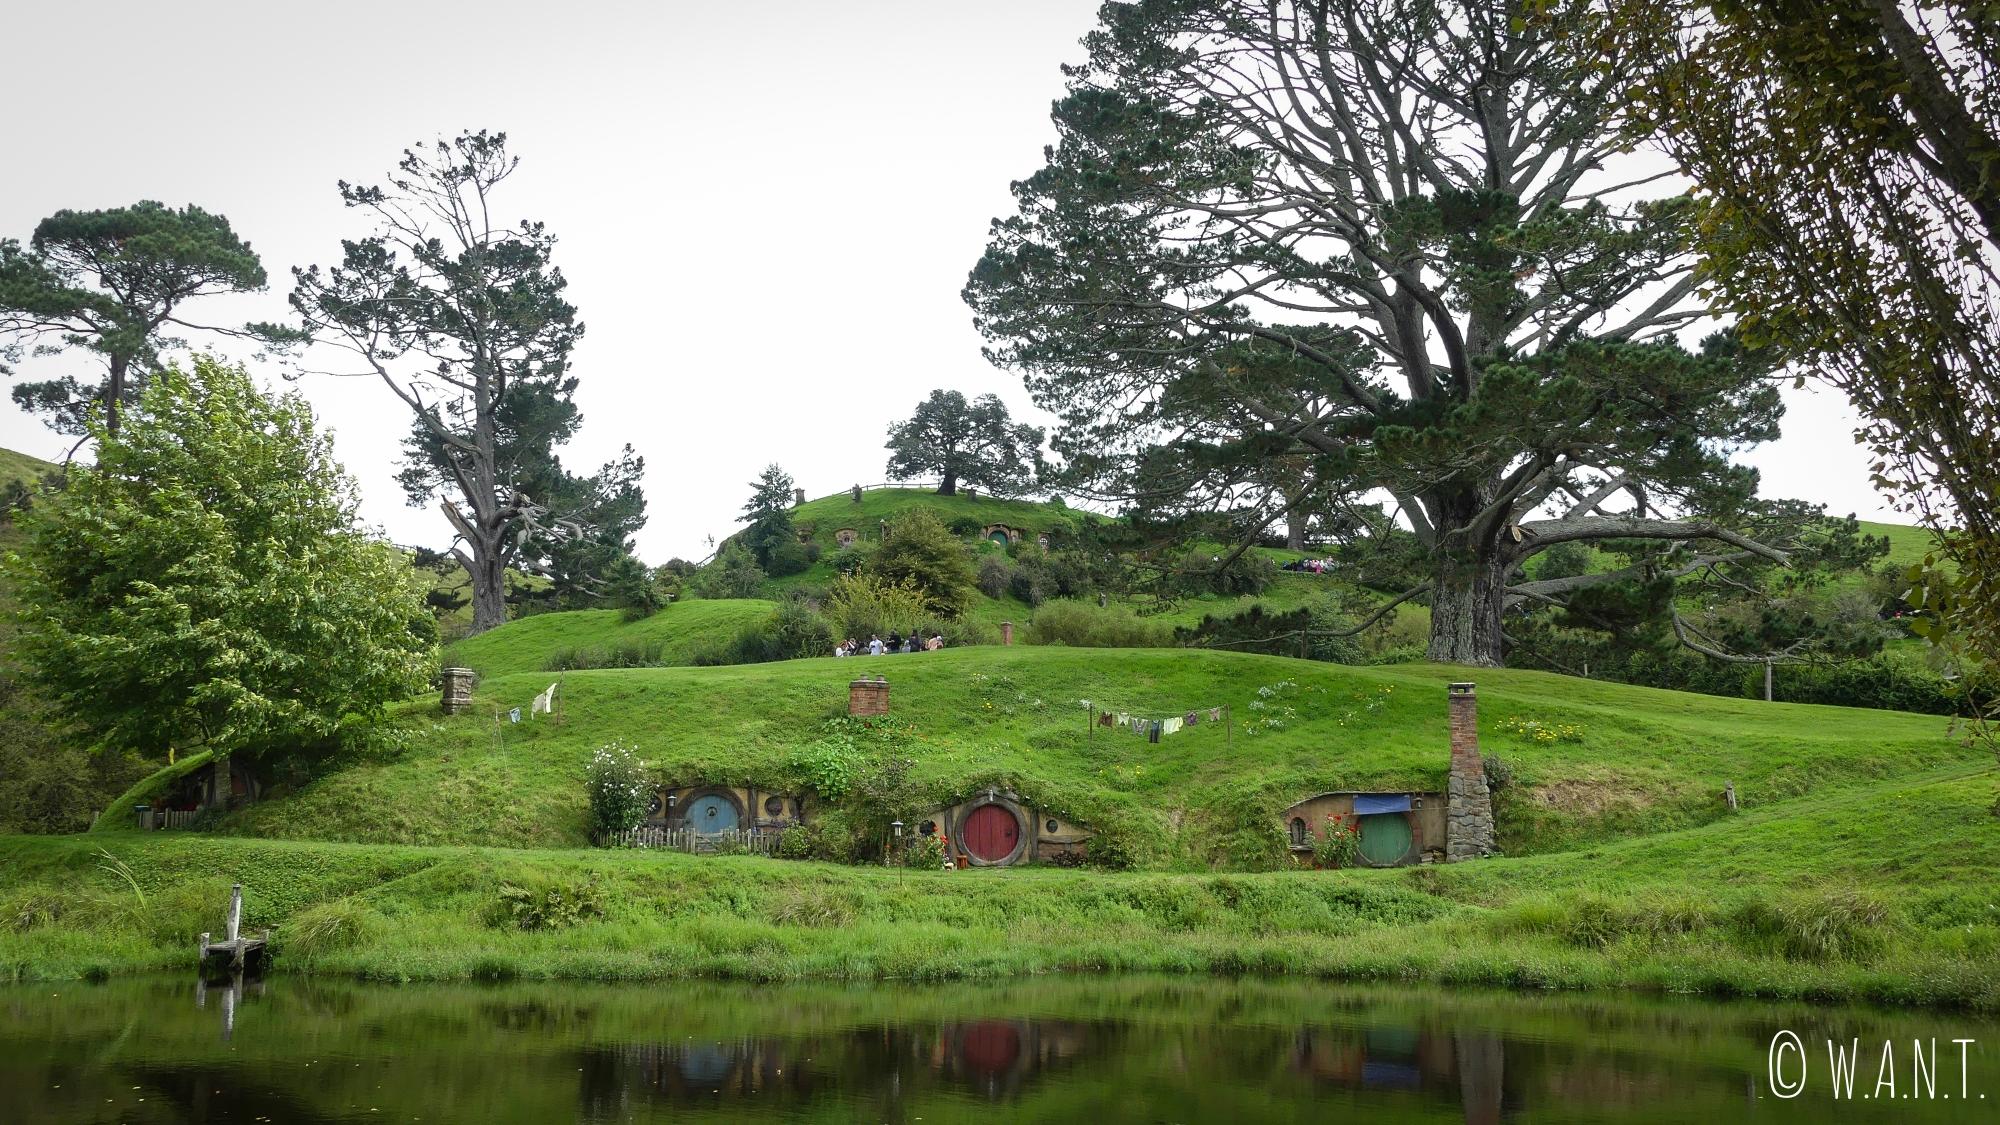 Décor de Hobbiton en Nouvelle-Zélande